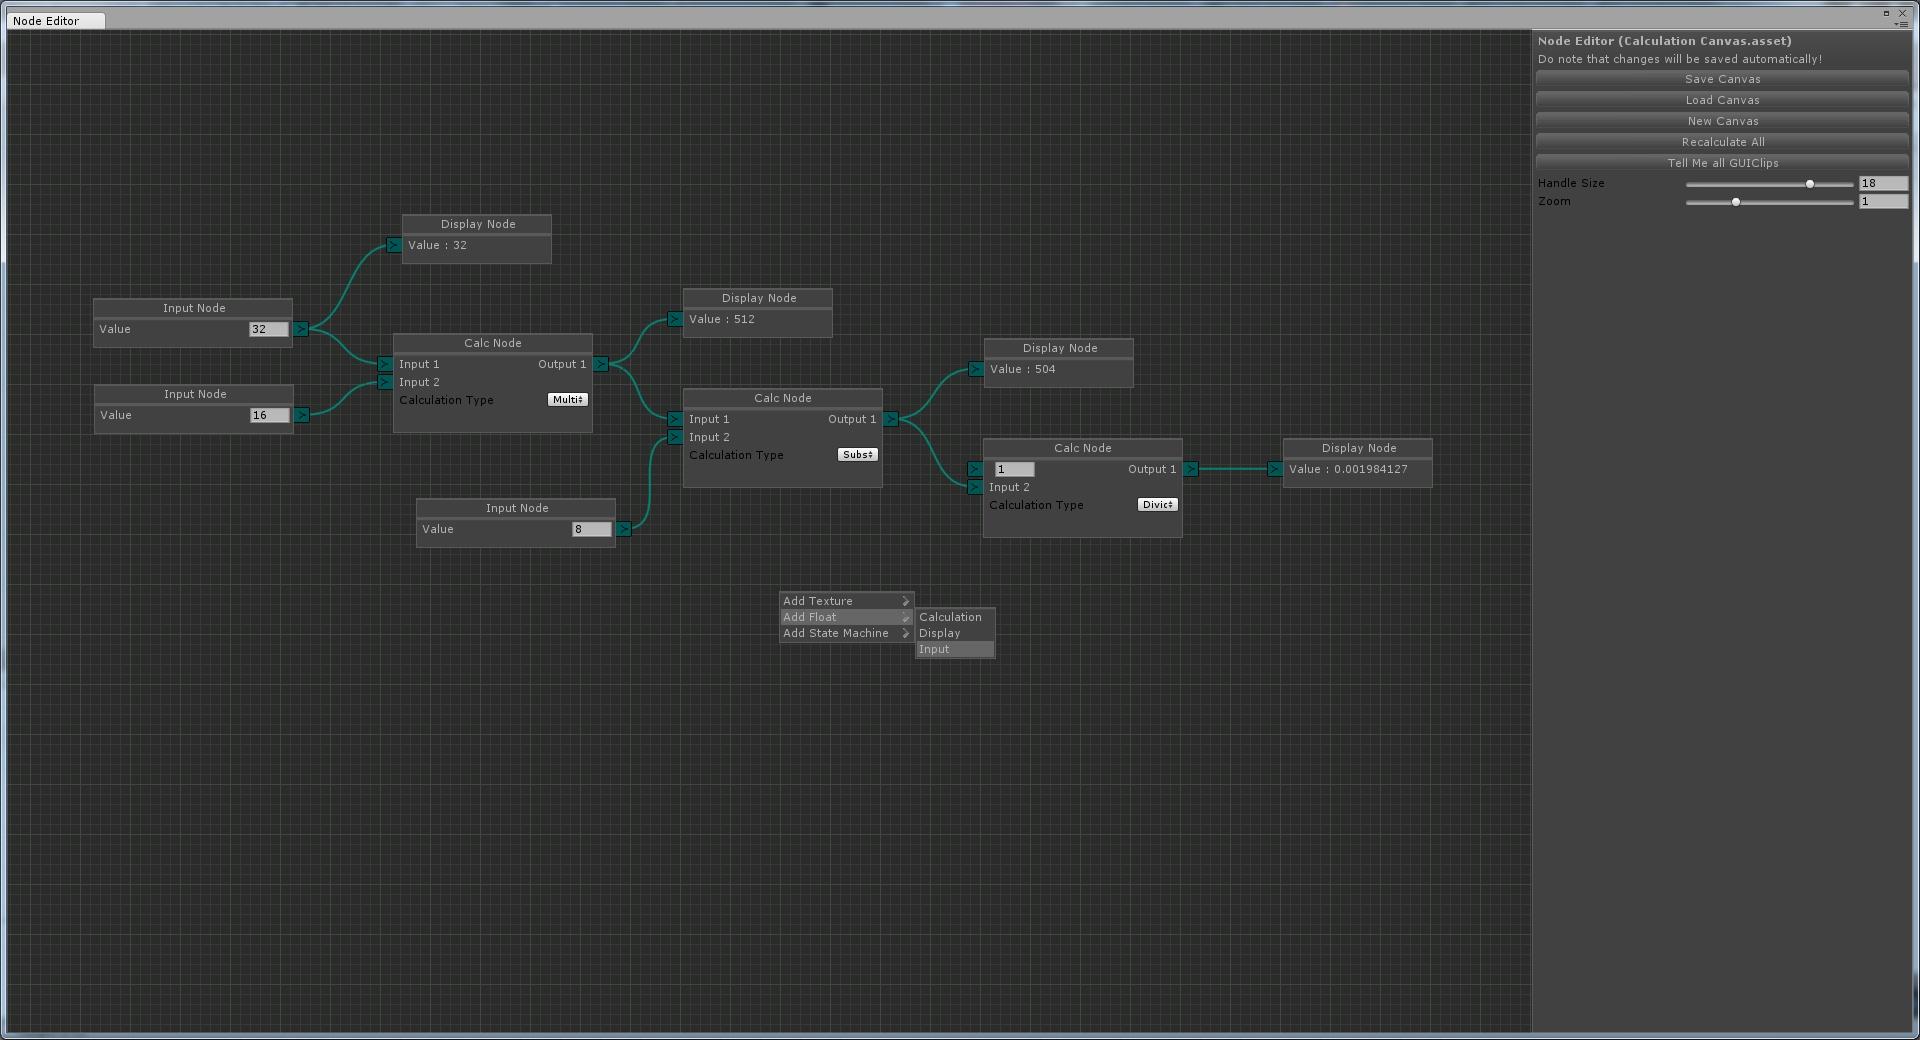 GitHub - vicenterusso/Node_Editor: Node Editor framework